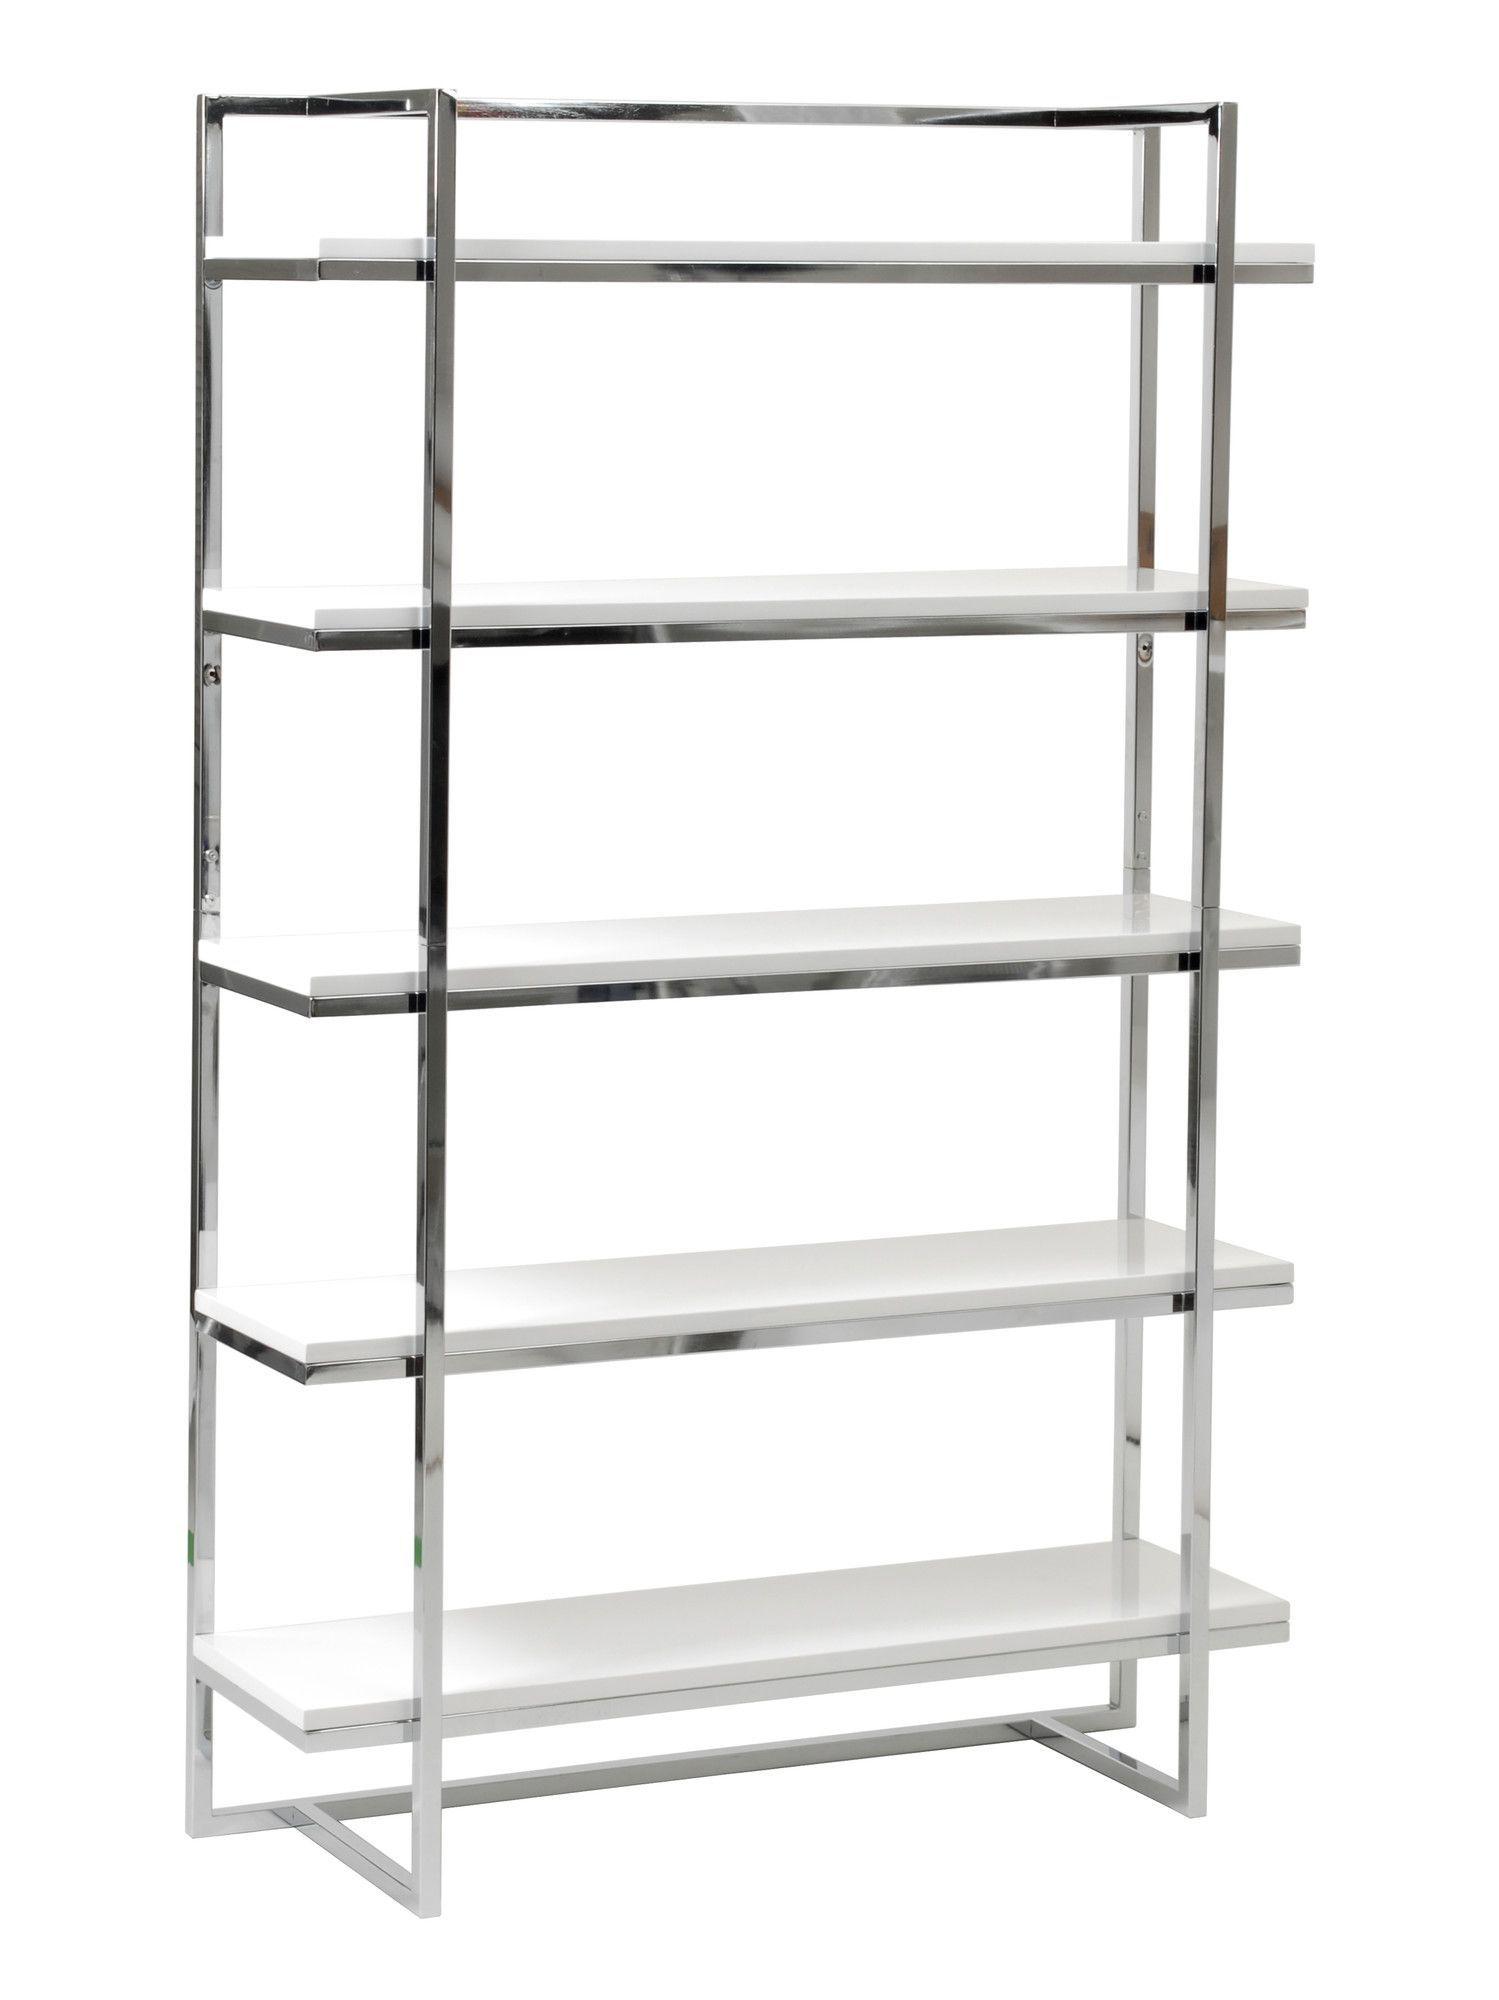 Eurostyle Gilow Backert Shelf | AllModern